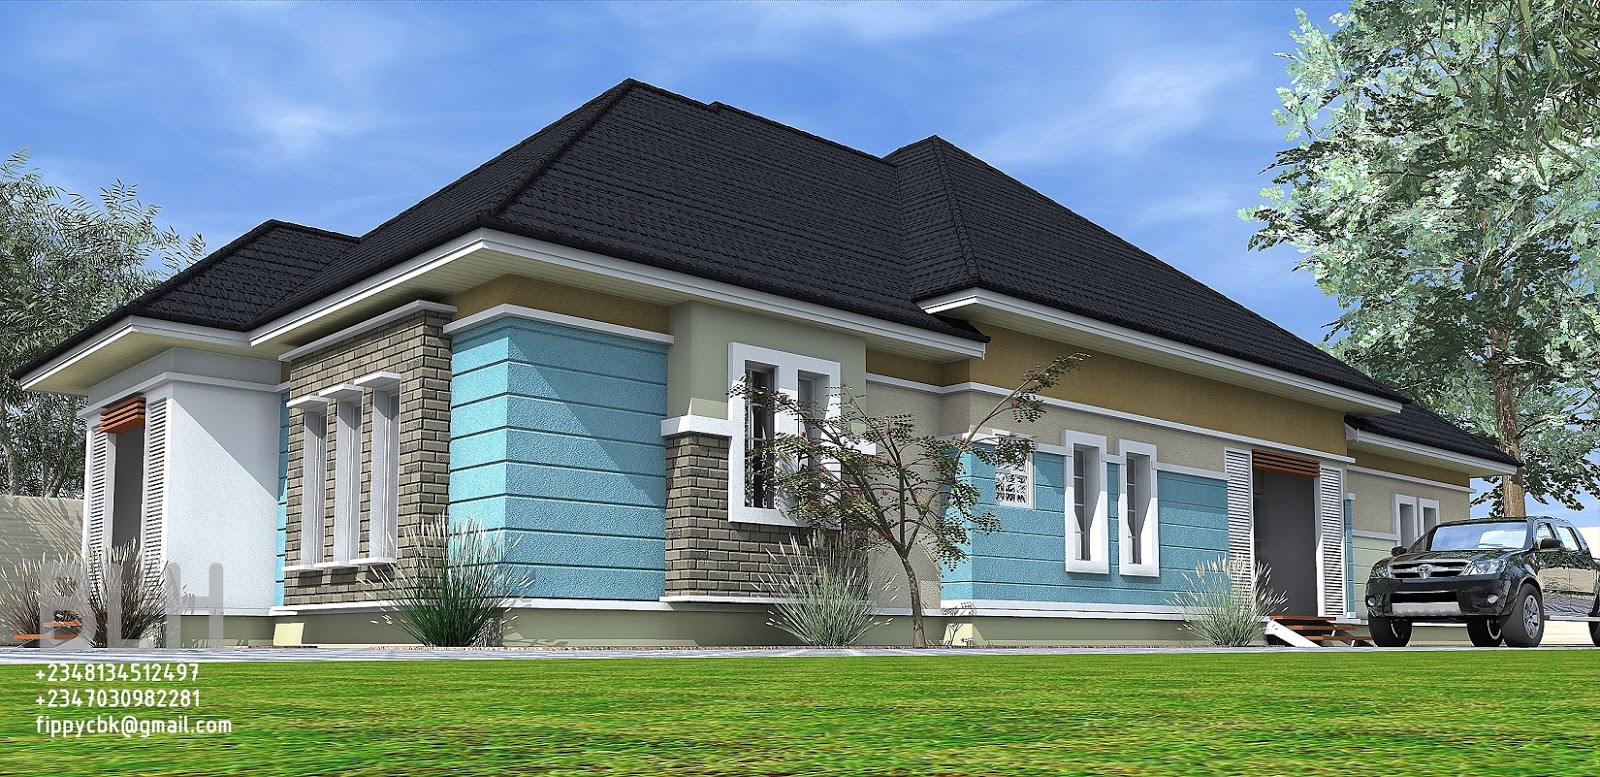 Building Plan For Bedroom Bungalow Home Ideas Decor